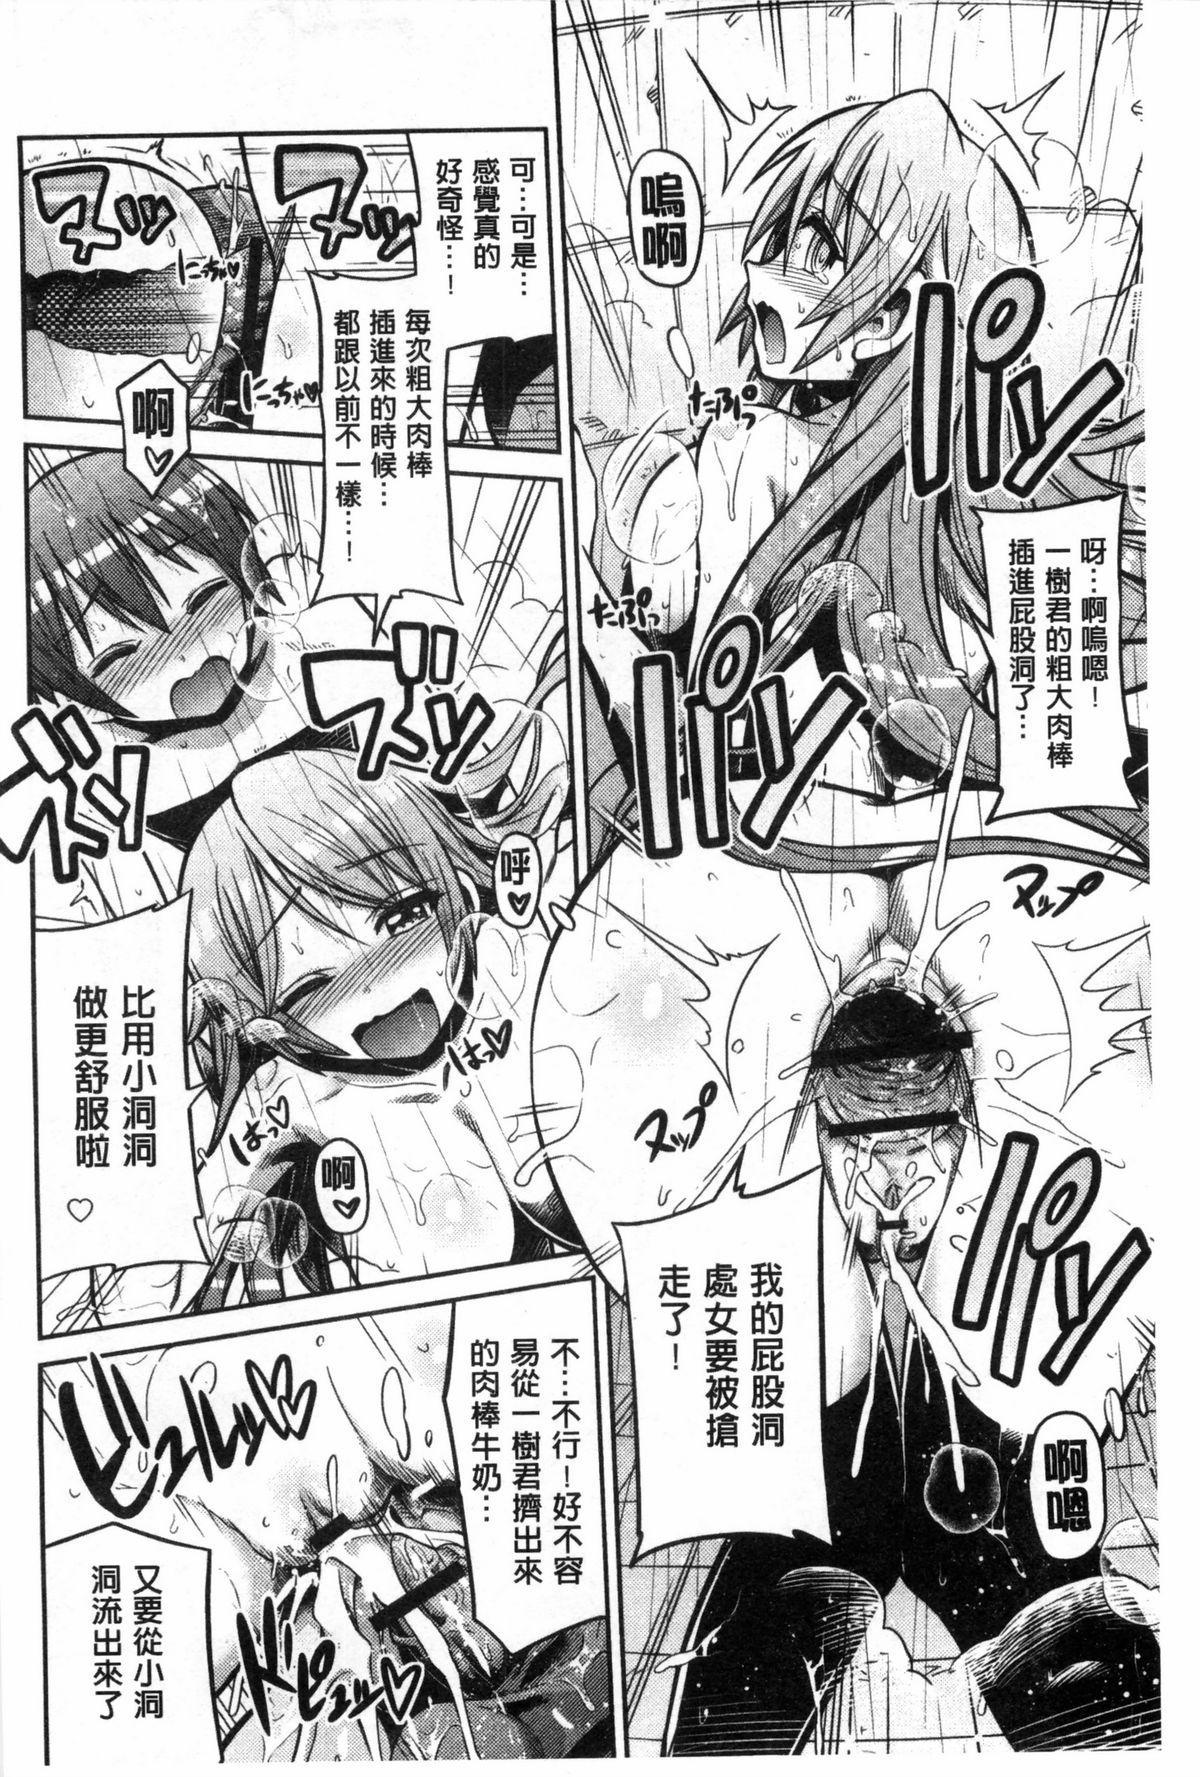 Man x Koi - Ero Manga de Hajimaru Koi no Plot   A漫×戀情 由情色漫畫所萌生的戀之物語 130